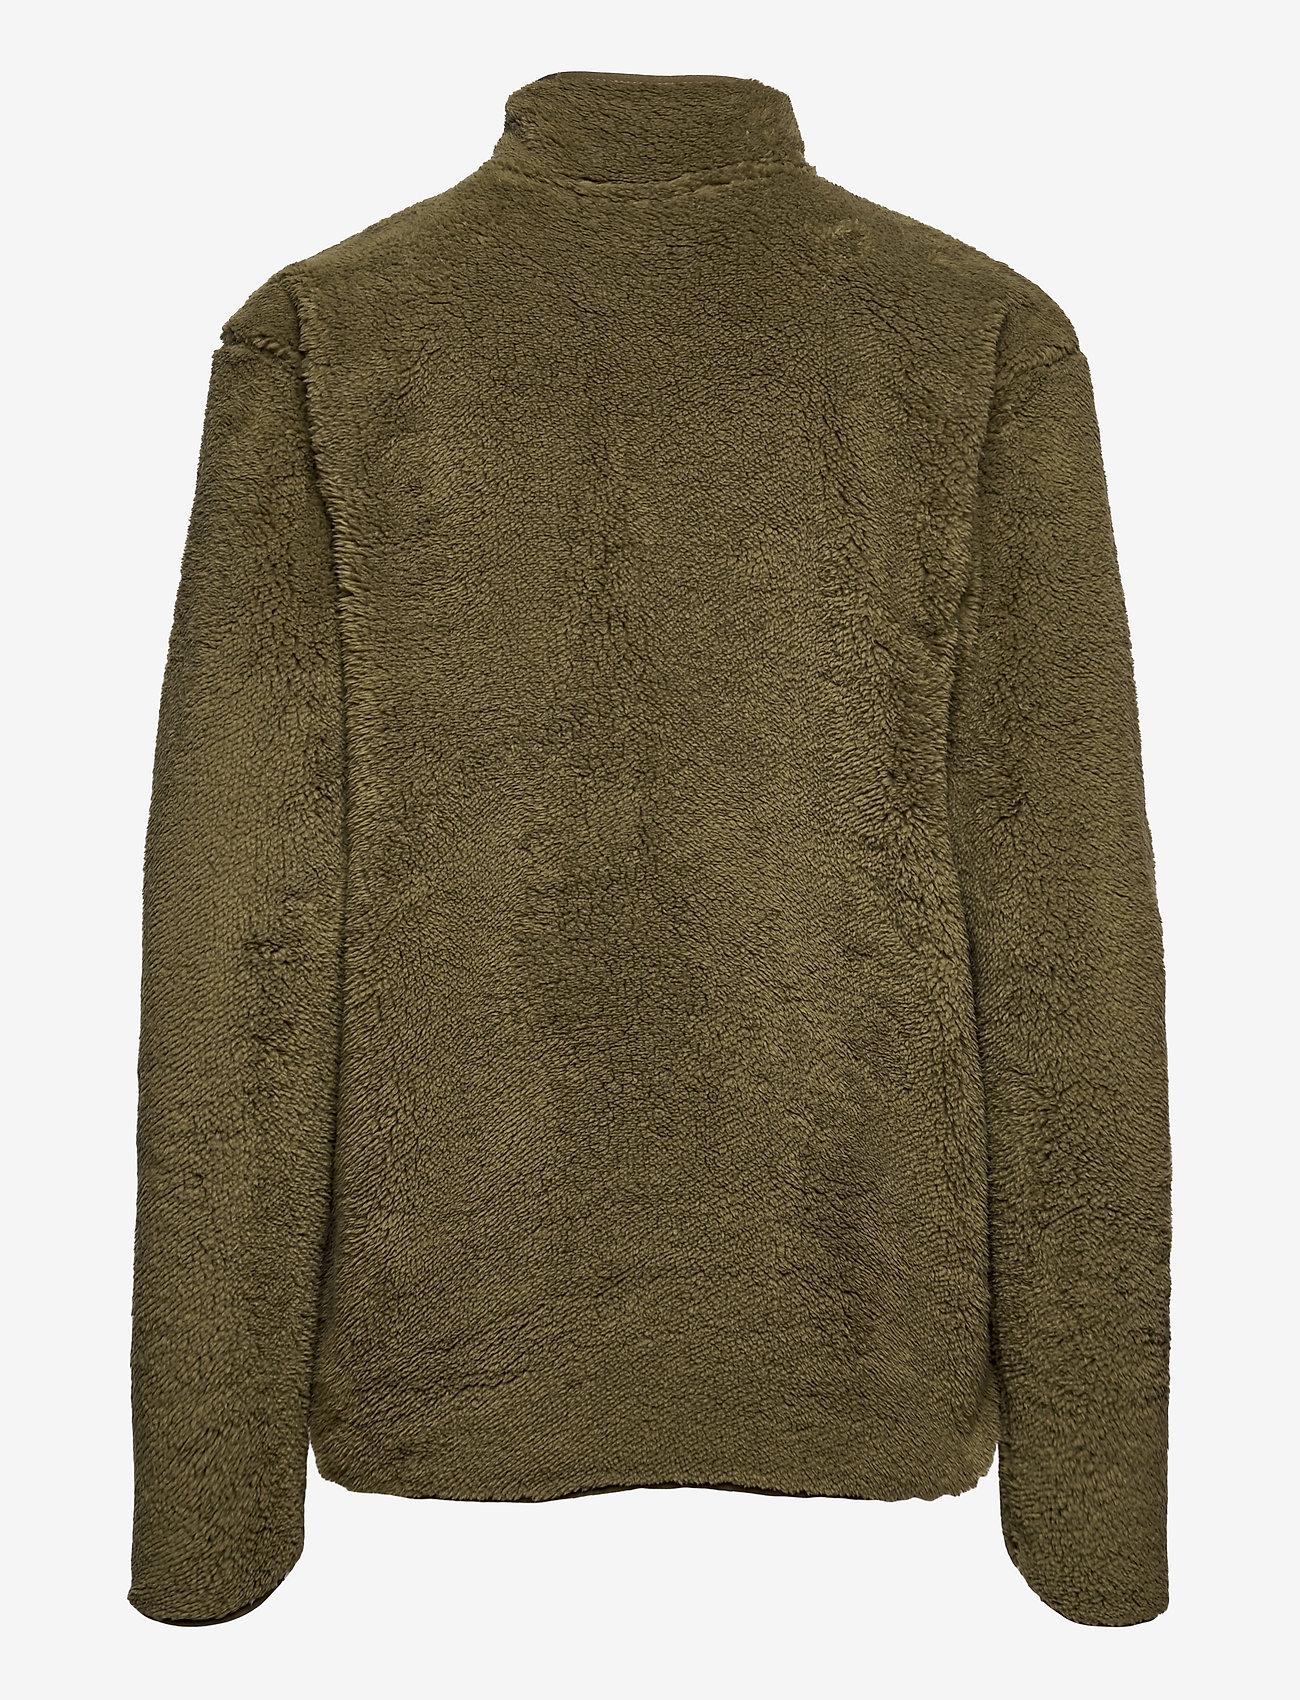 Tenson - Nechako Pile Jkt M - basic-sweatshirts - olive - 1